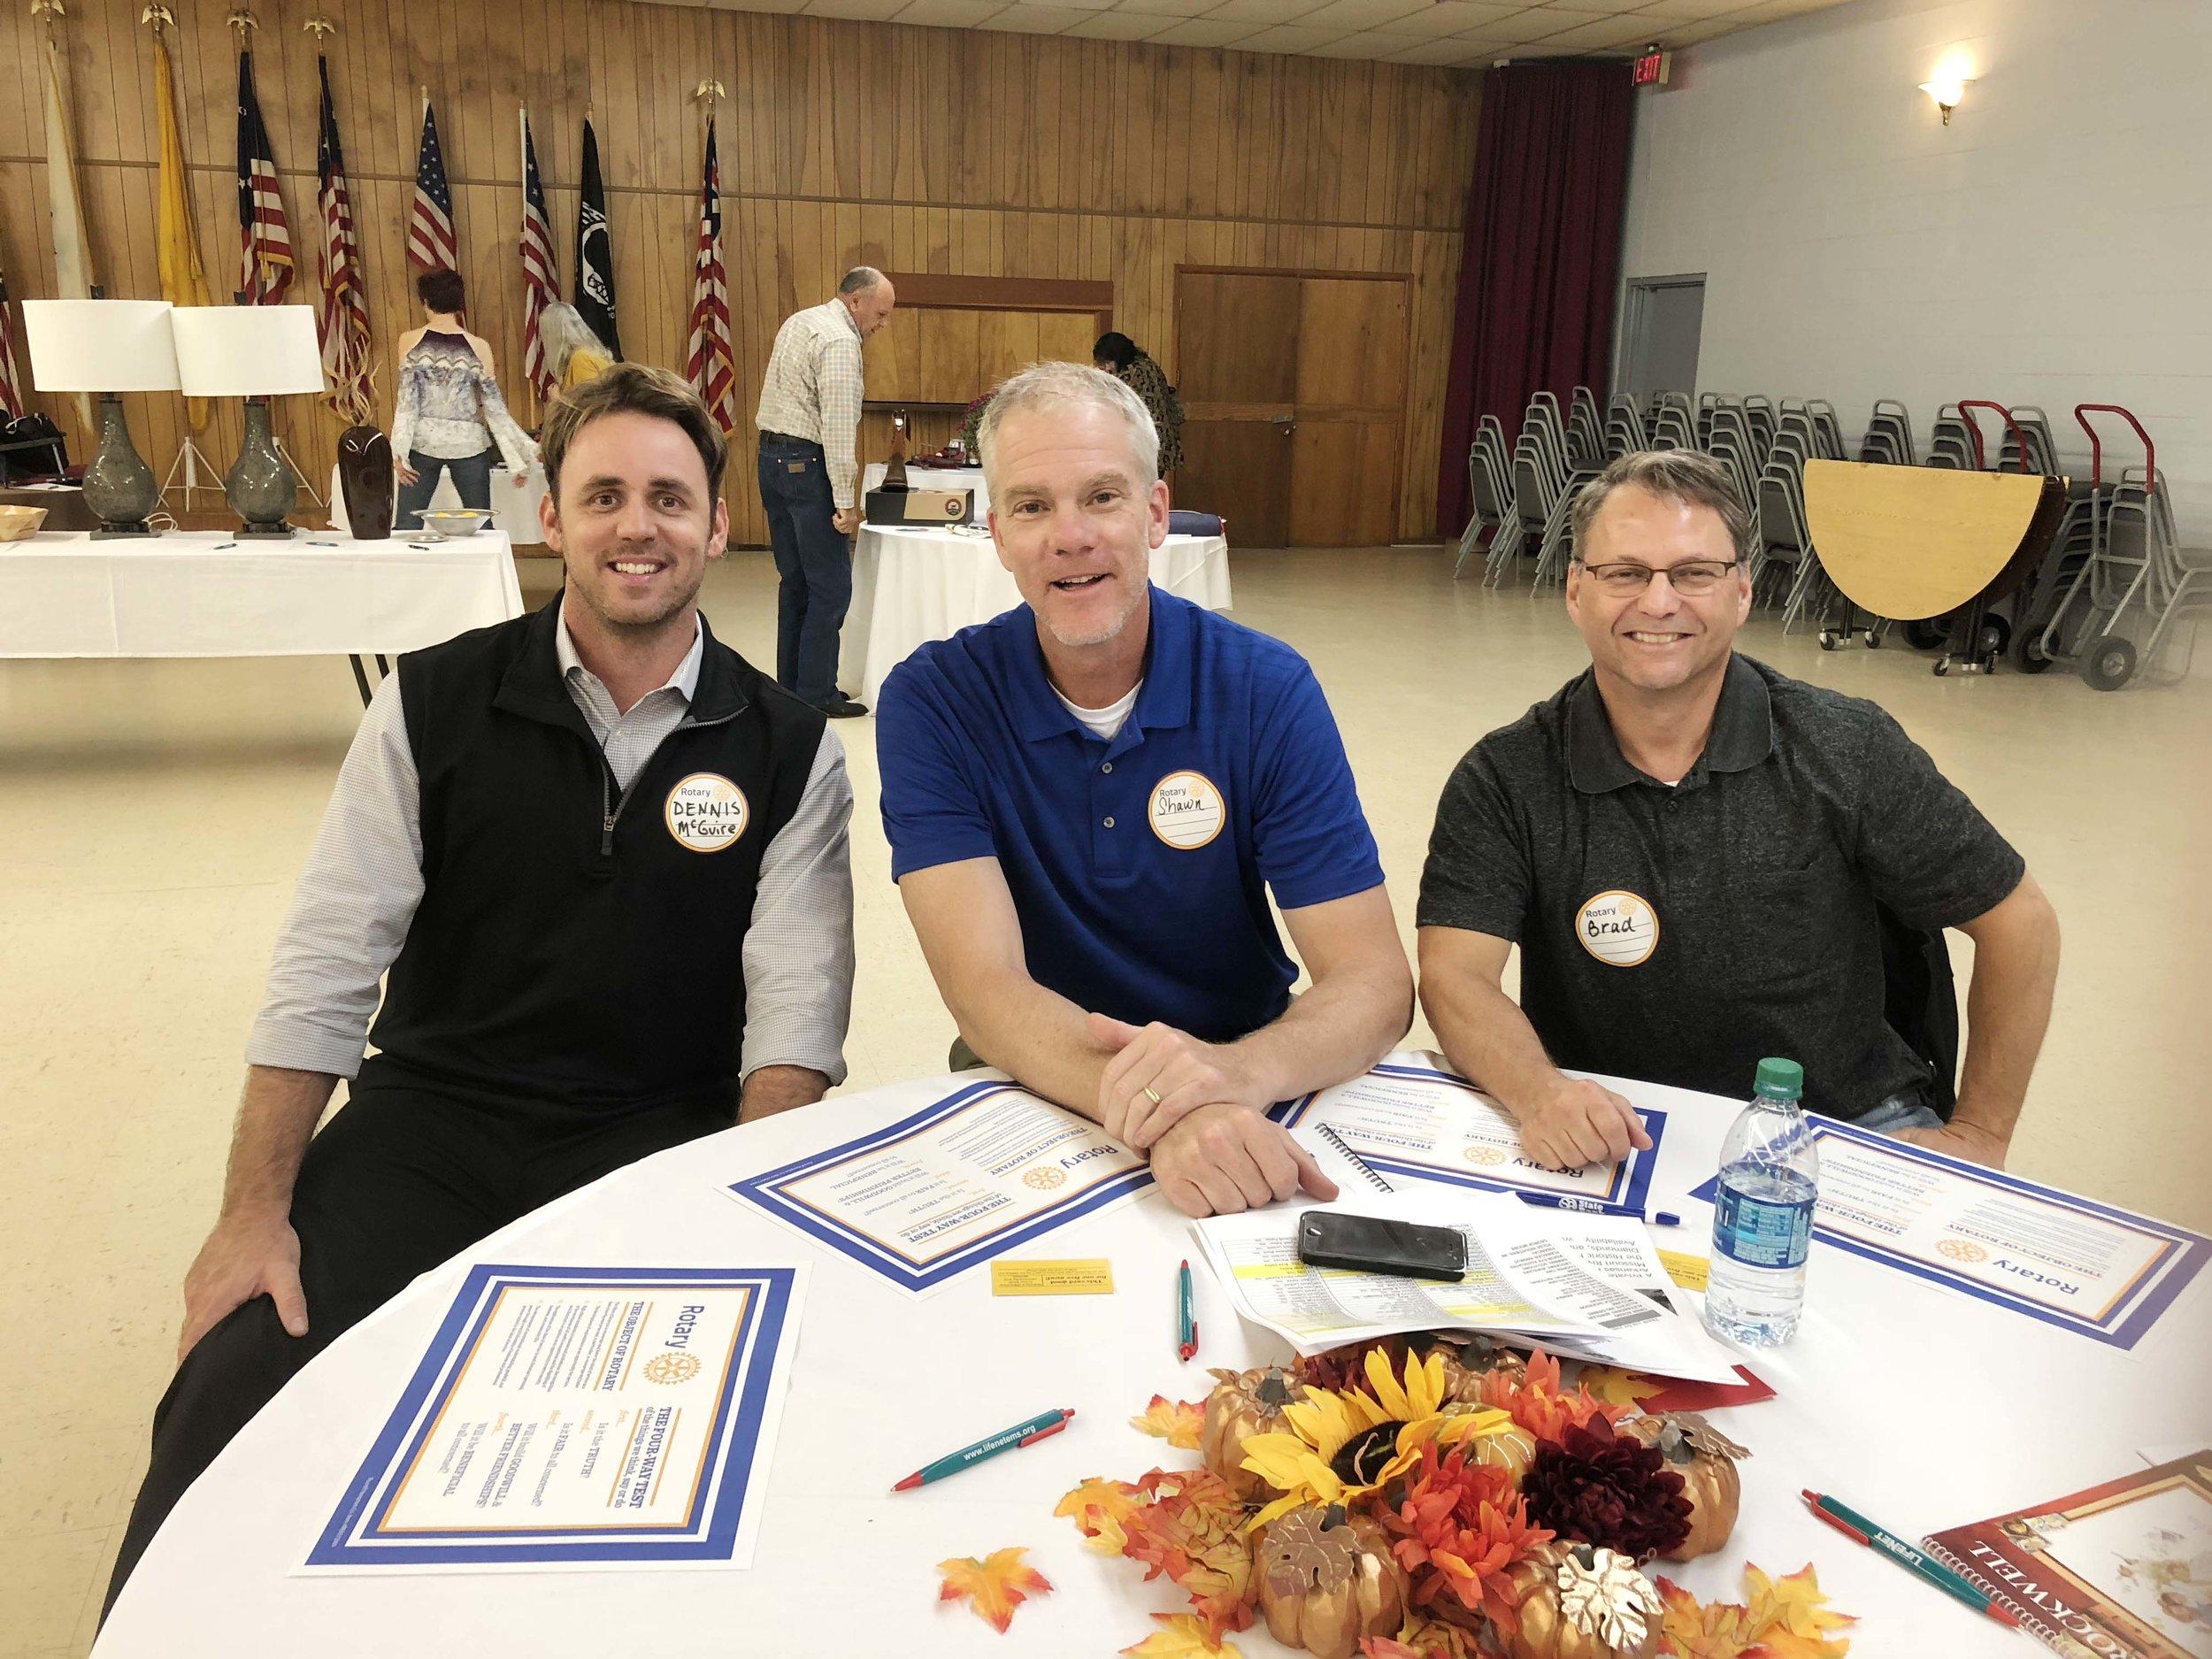 Dennis McGuire, Shawn Davis and Brad Bailey